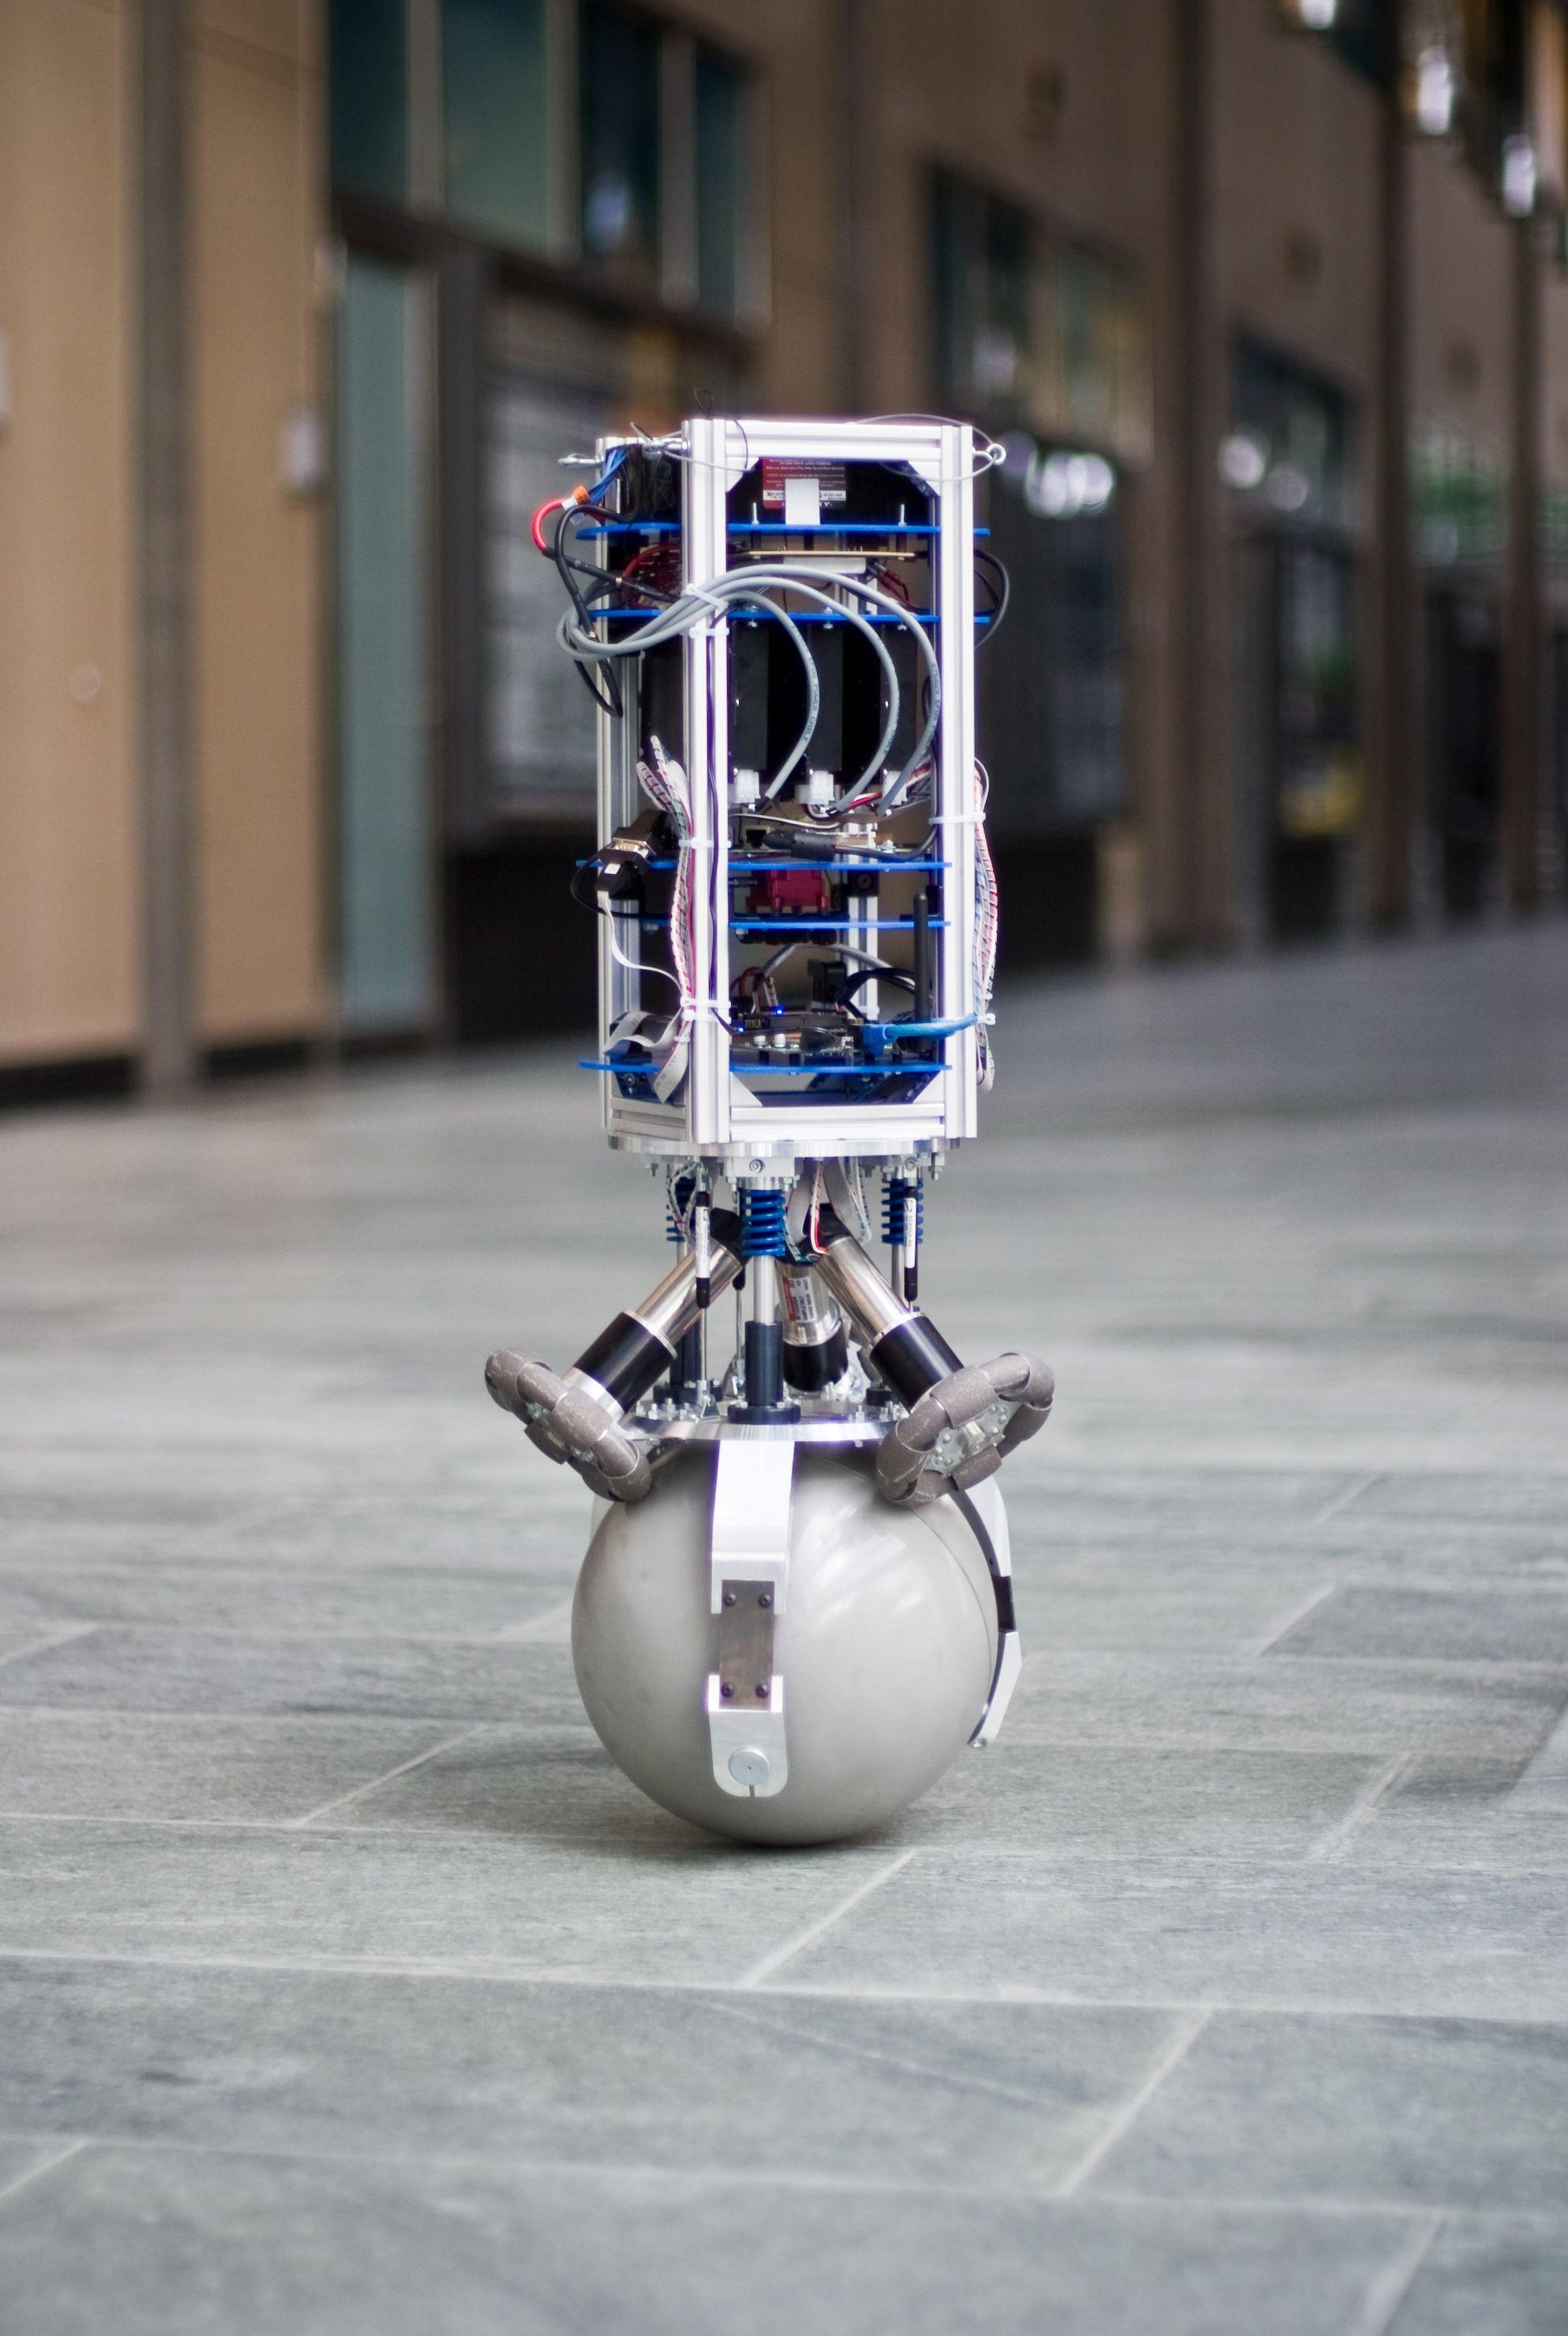 Rezero a robot designed to balance on ball your own